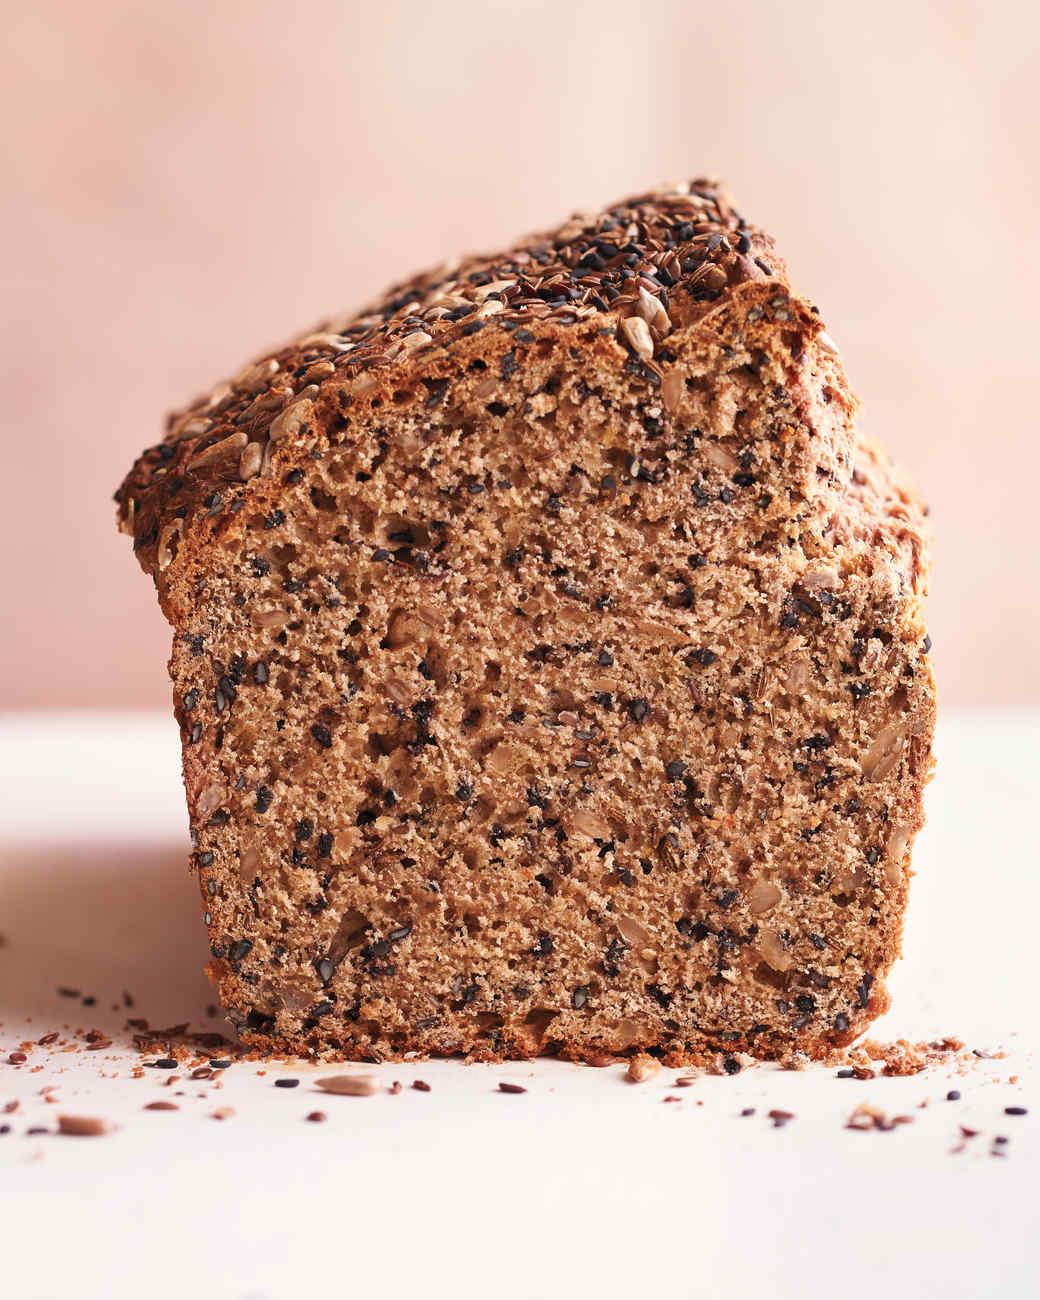 quick-bread-005-d111788.jpg